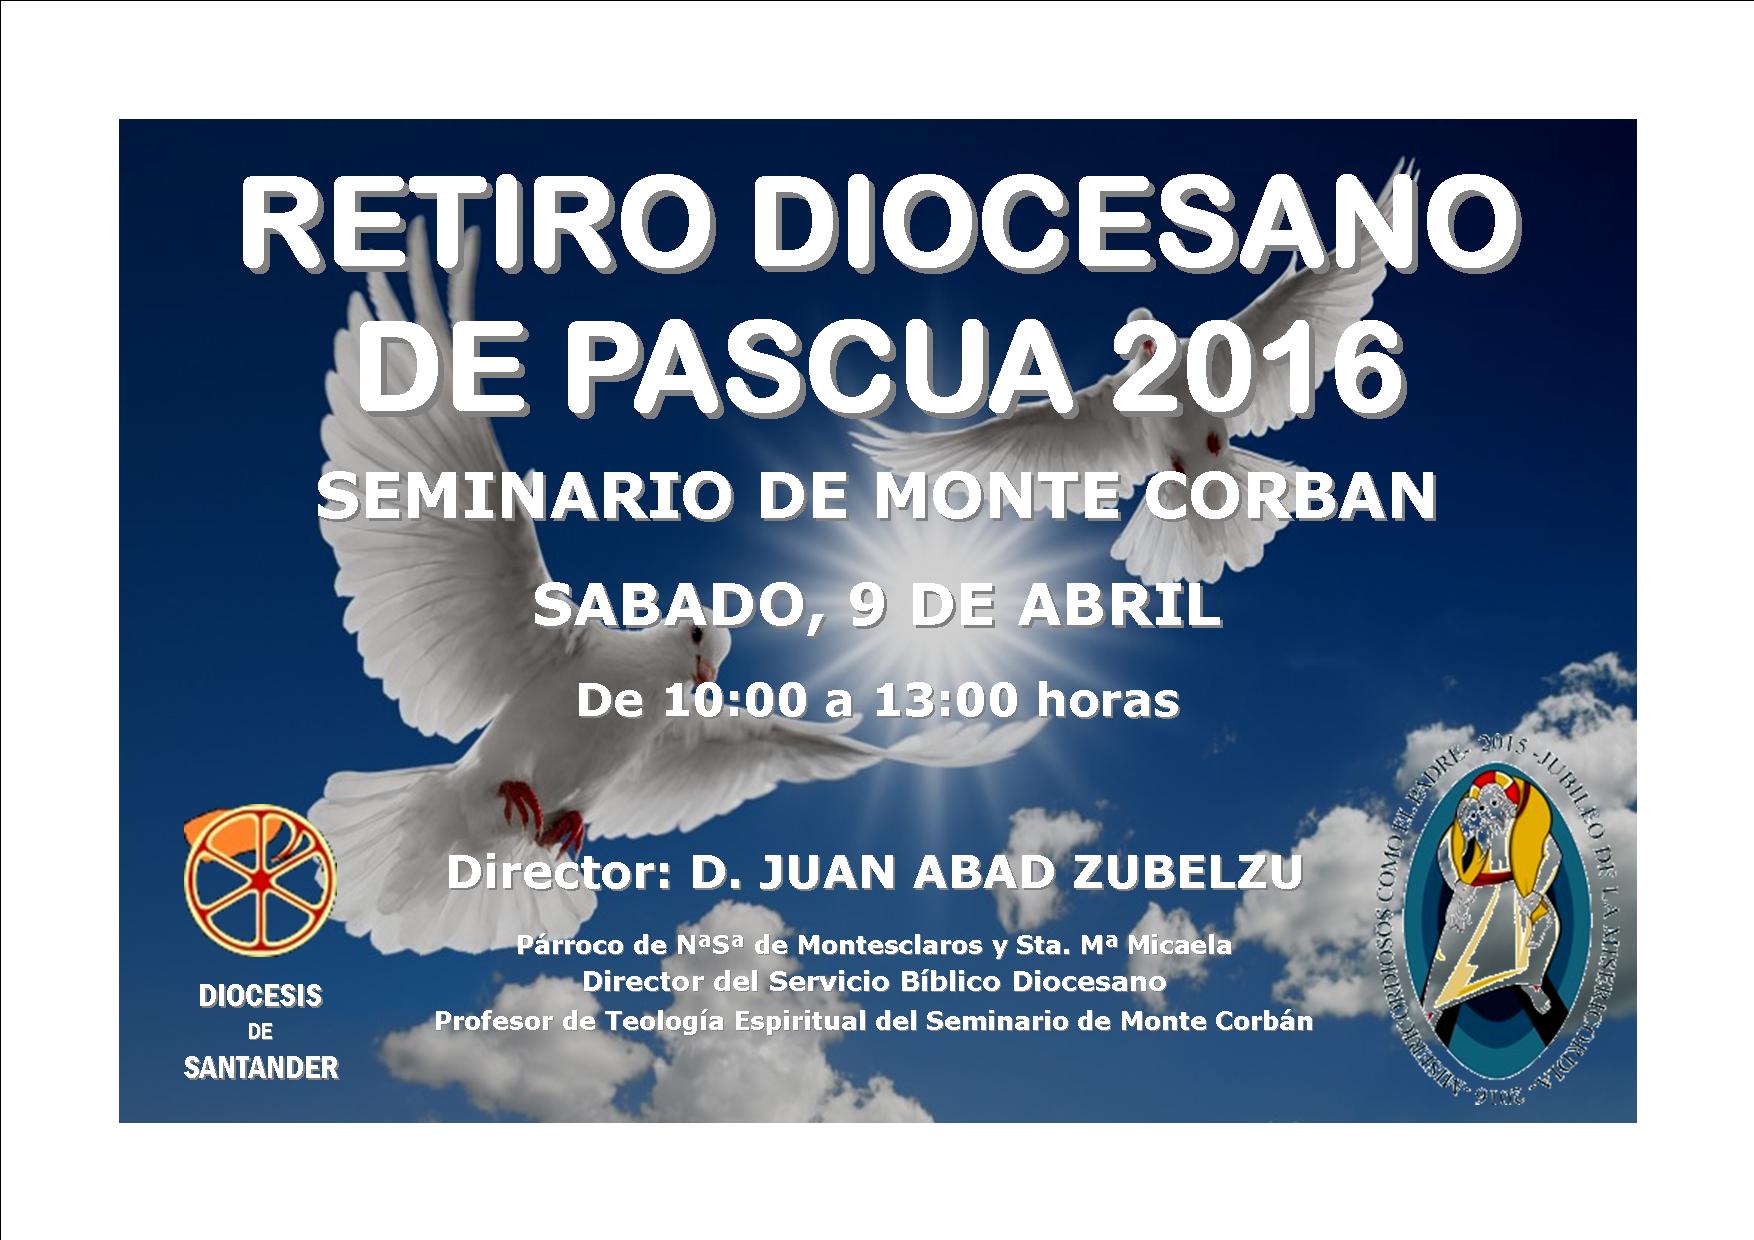 Retiro Diocesano de Pascua 2016